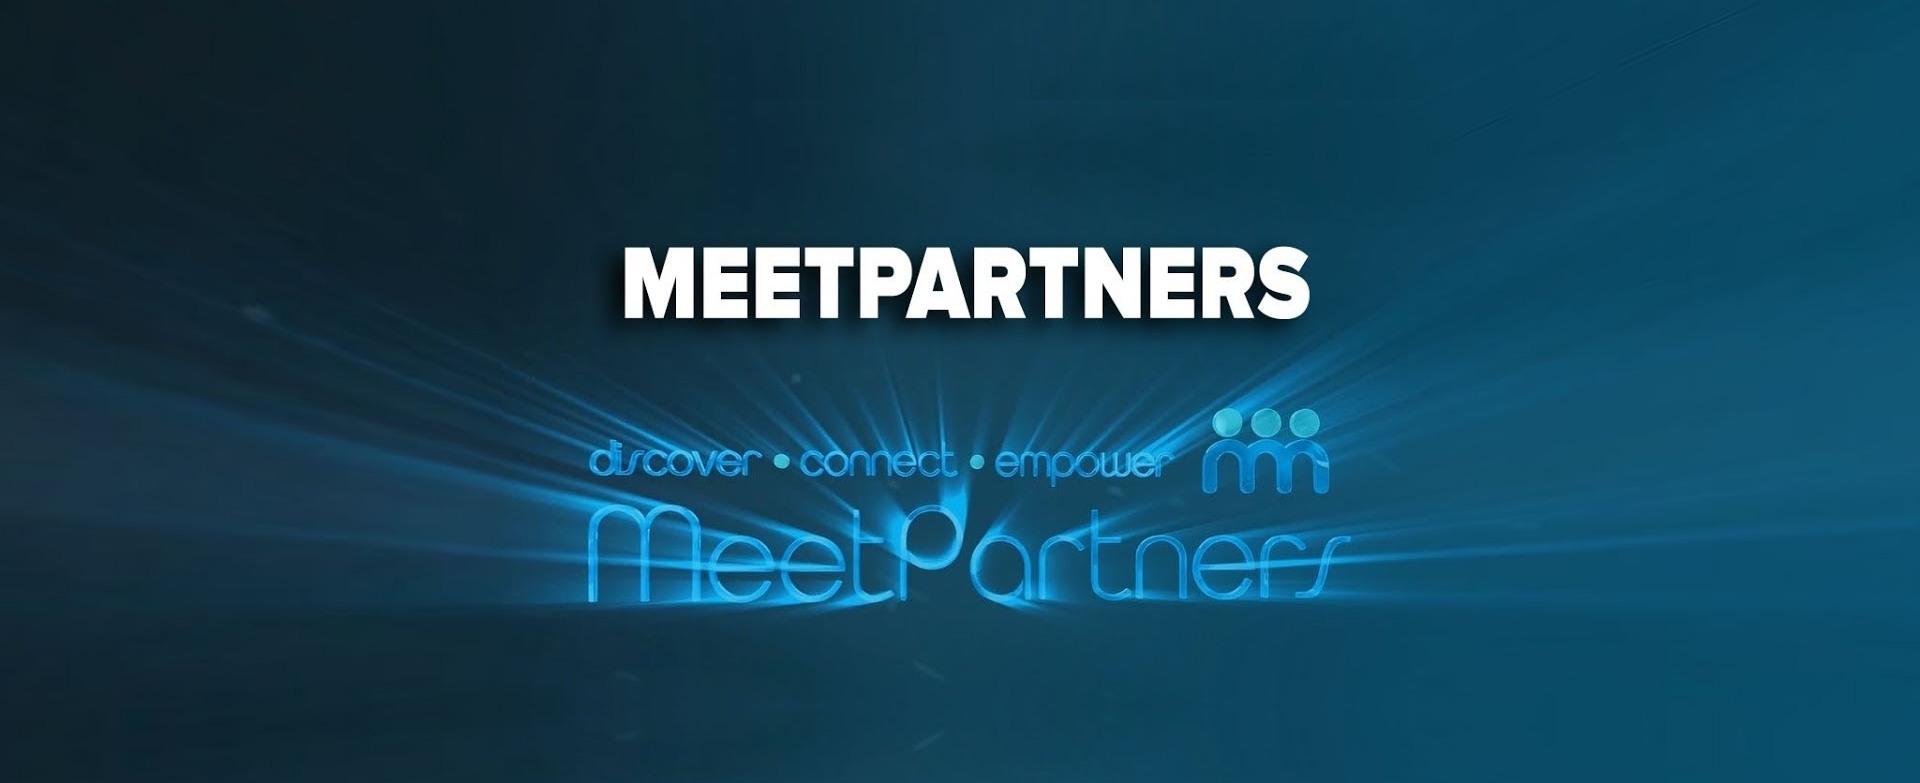 MeetPartners